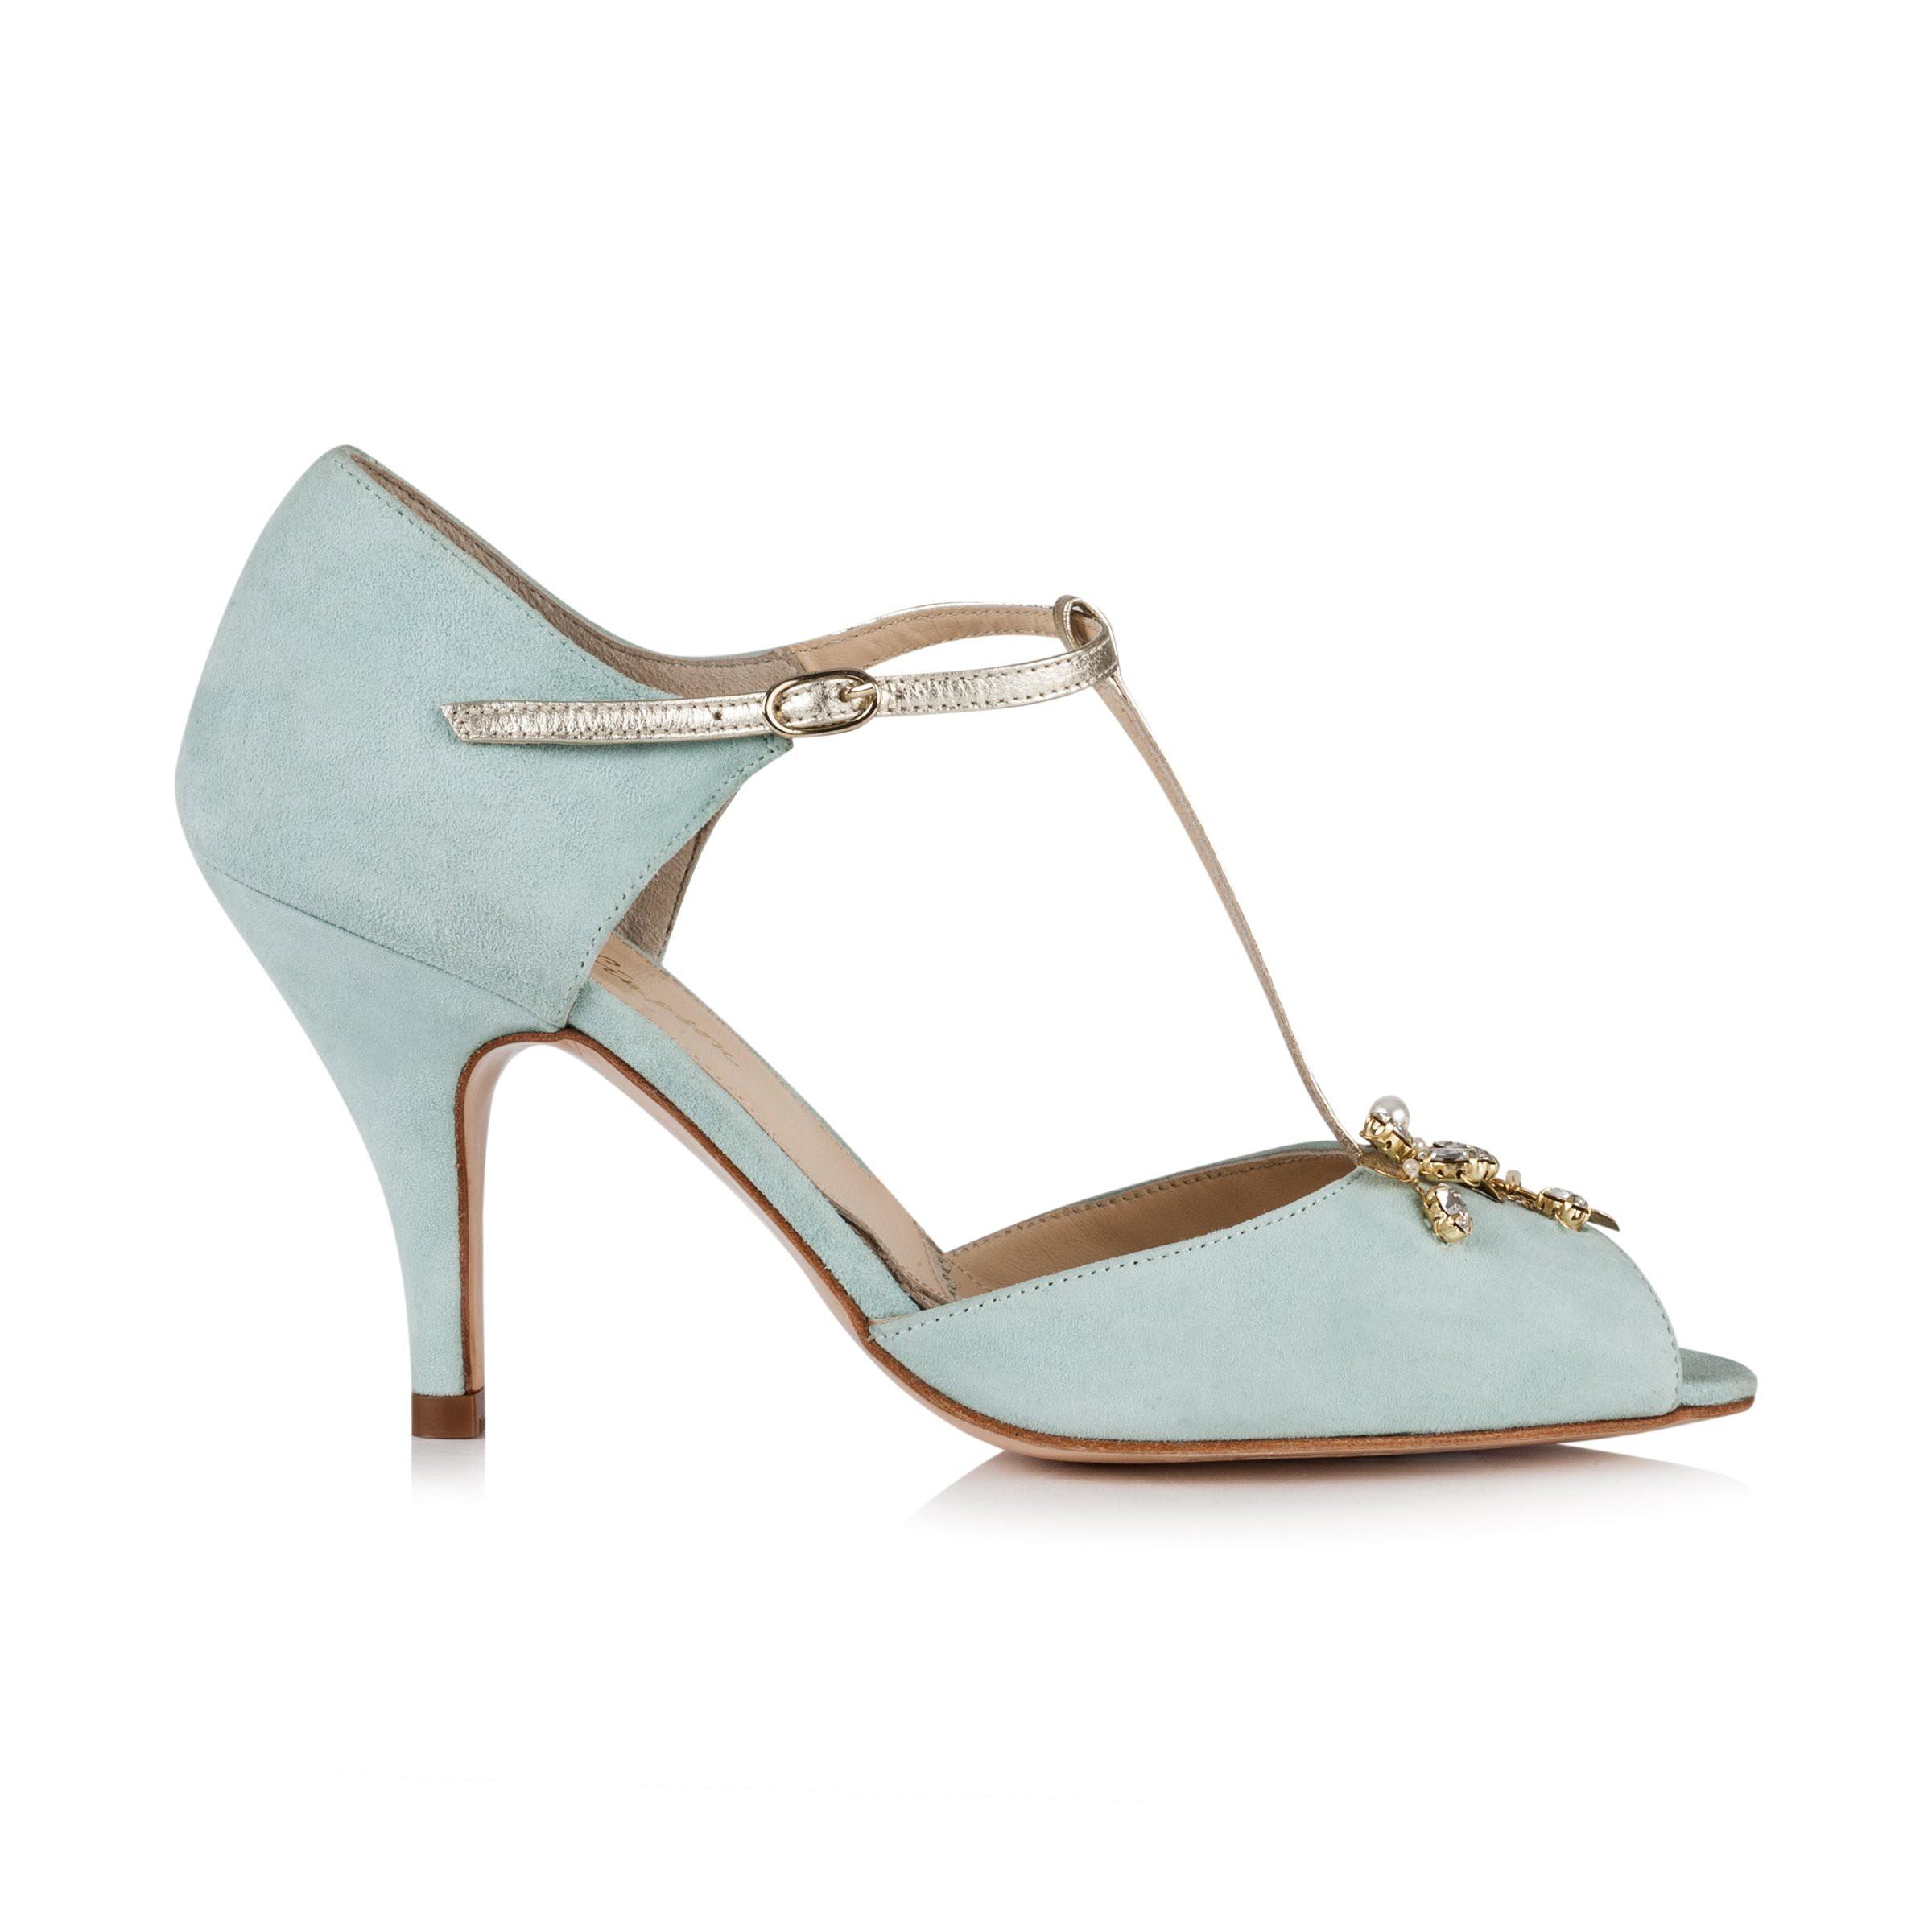 abcc340e82b Rachel Simpson Wedding Shoes Amalia Mint